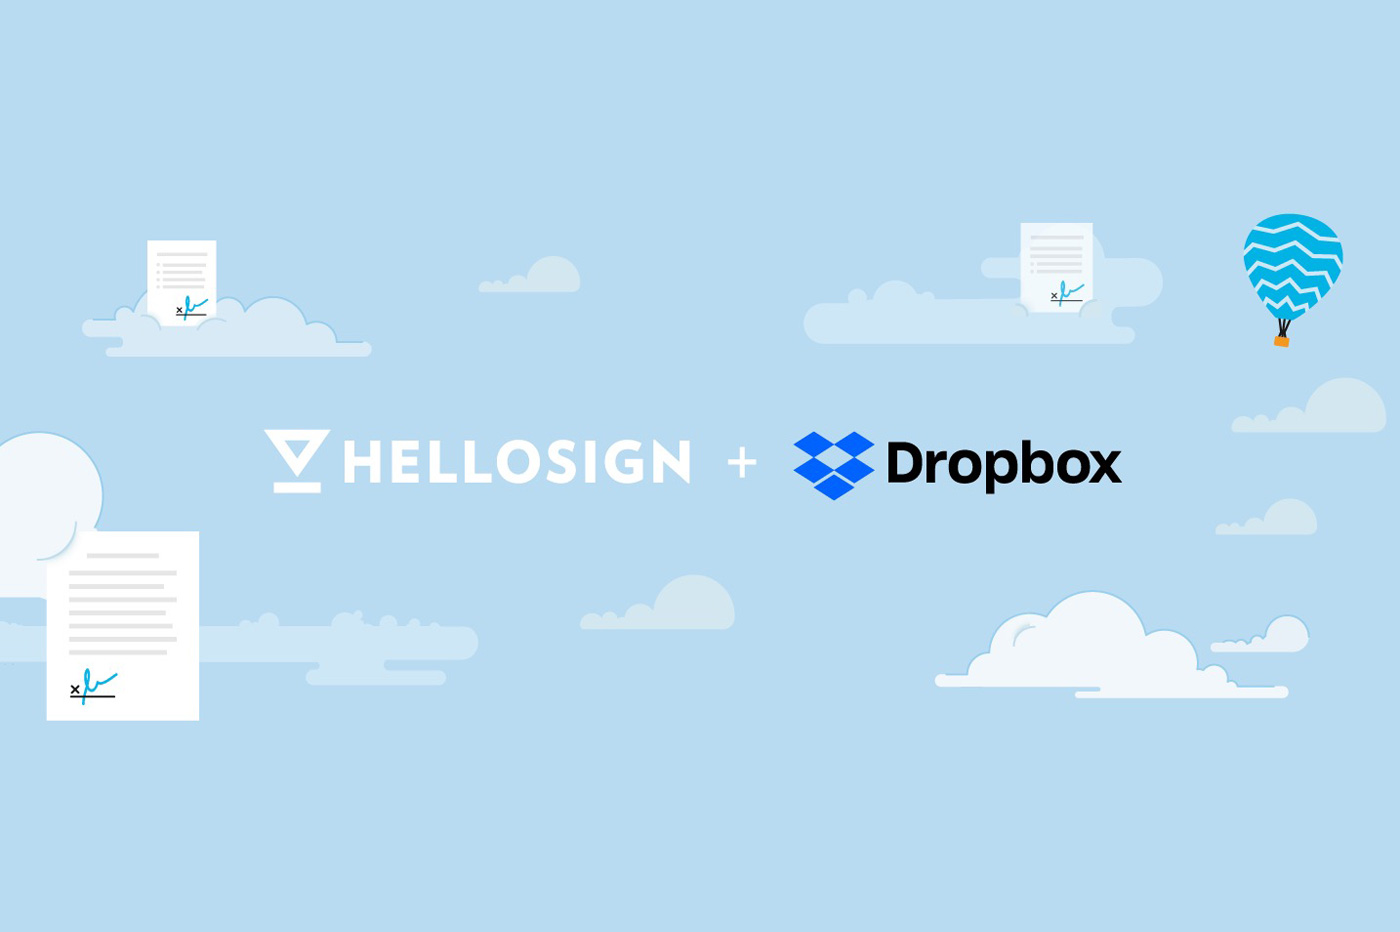 HelloSign-Dropbox